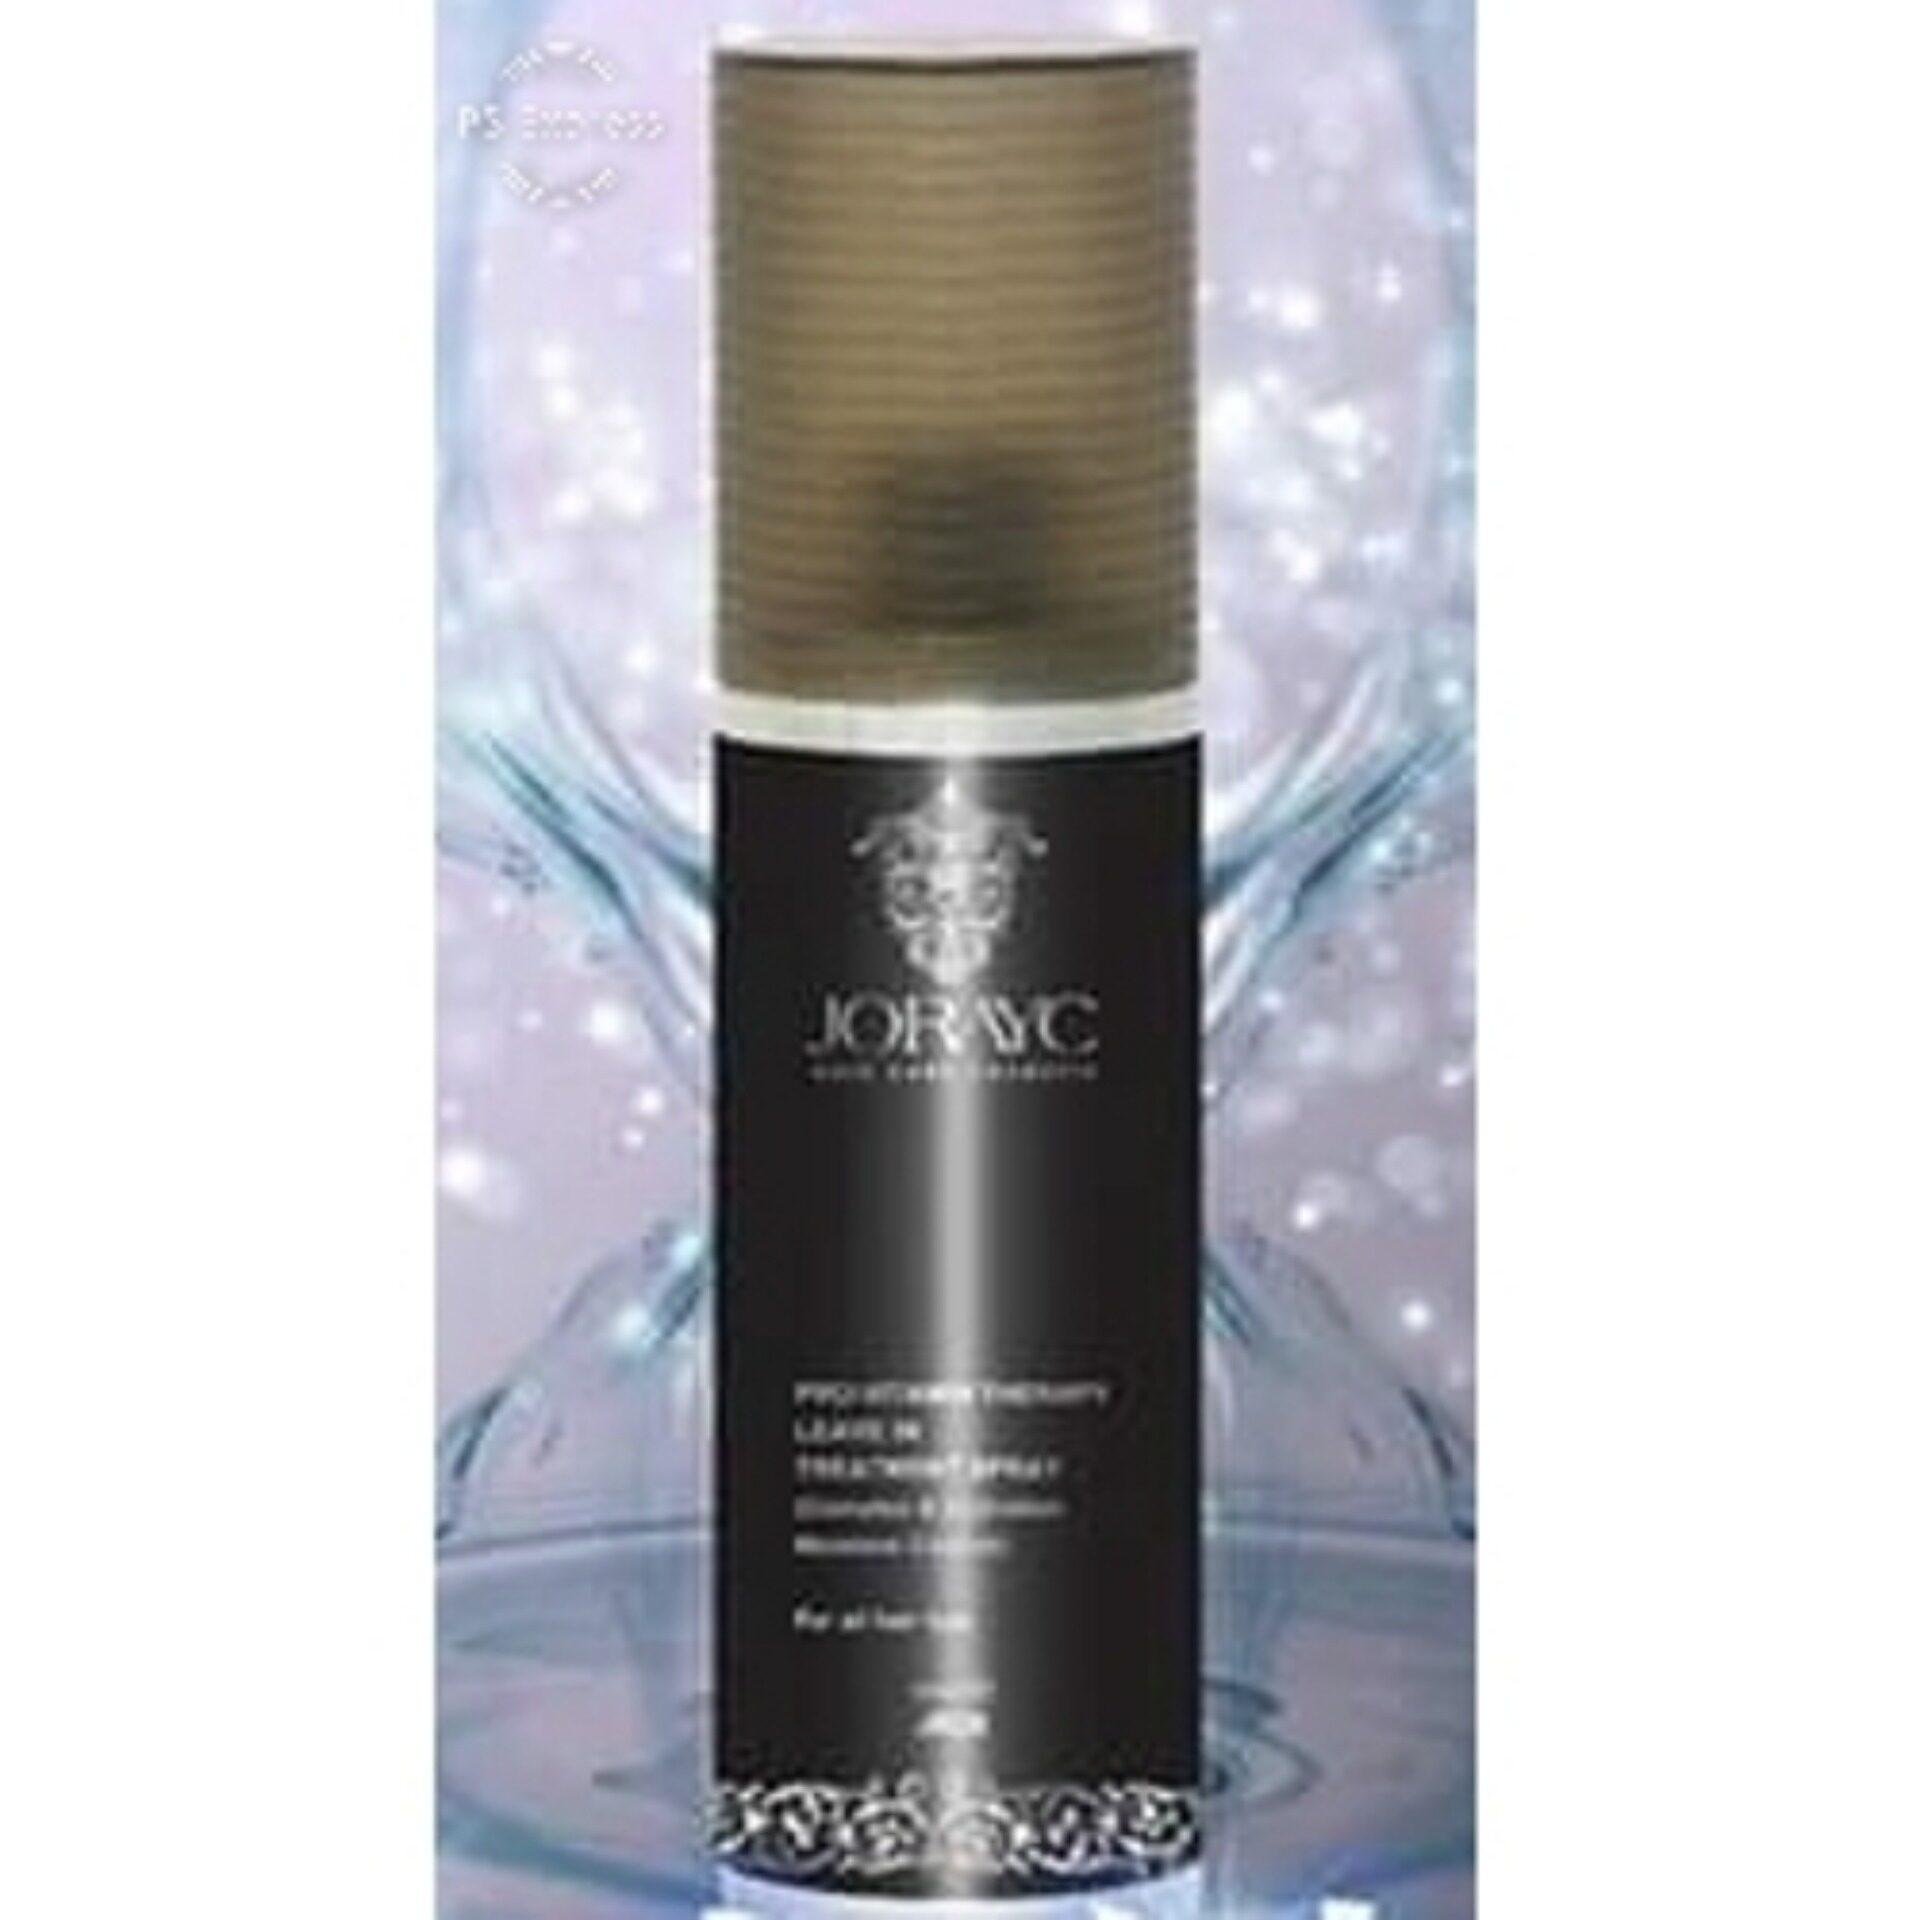 Jorayc Pro-Vitamin Therapy Leave-in Treatment Spray 180ml